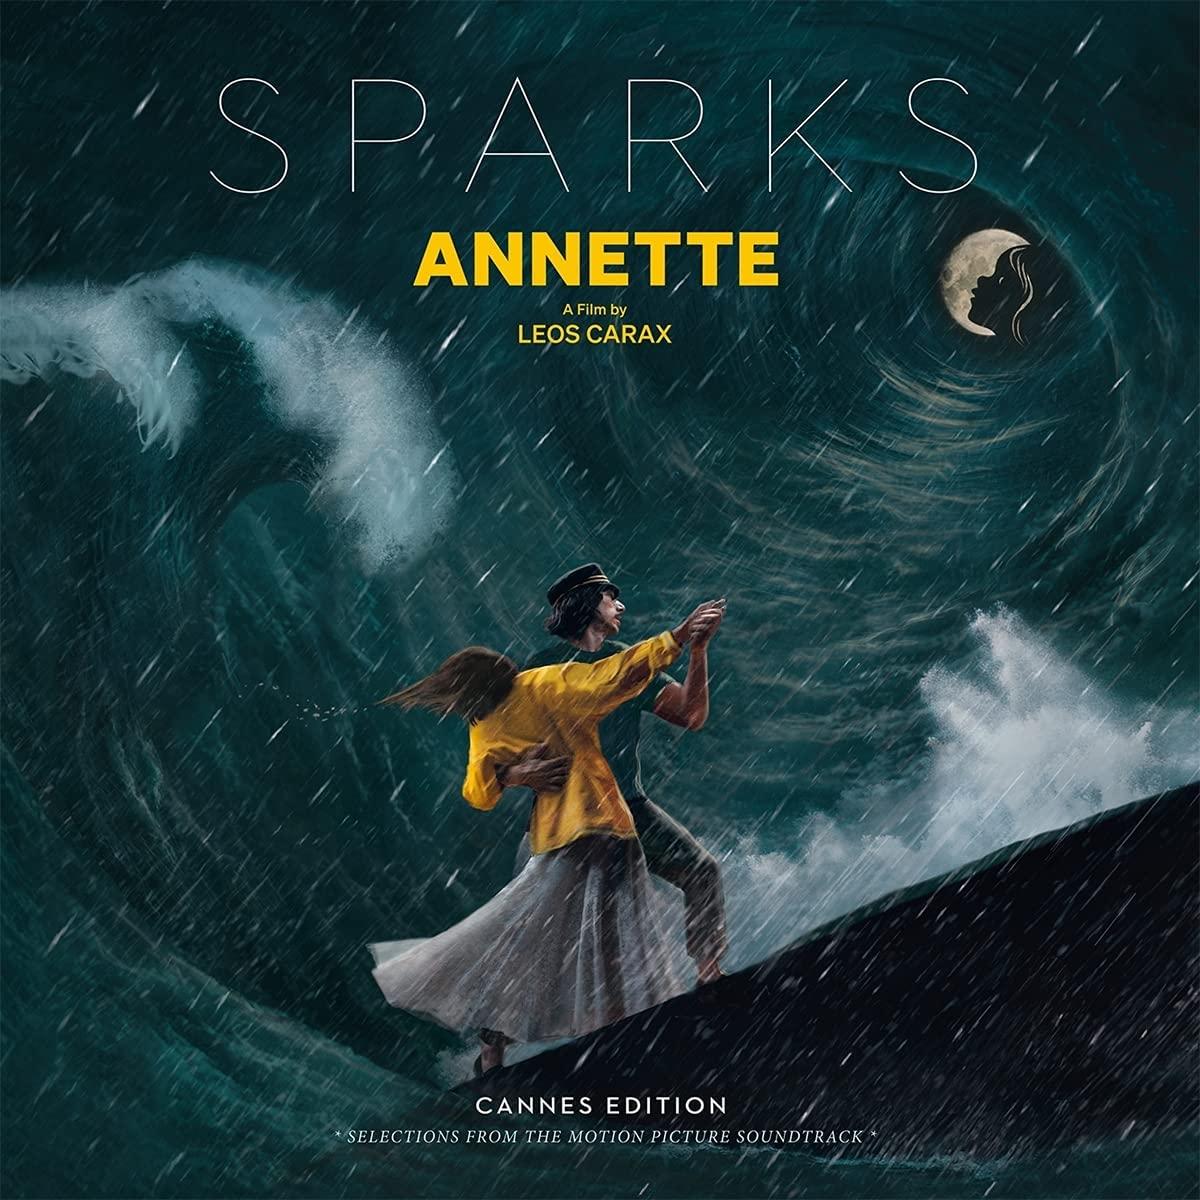 Виниловая пластинка Sparks - Annette (Original Motion Picture Sountrack) (180 Gram Black Vinyl/Gatefold/Booklet)